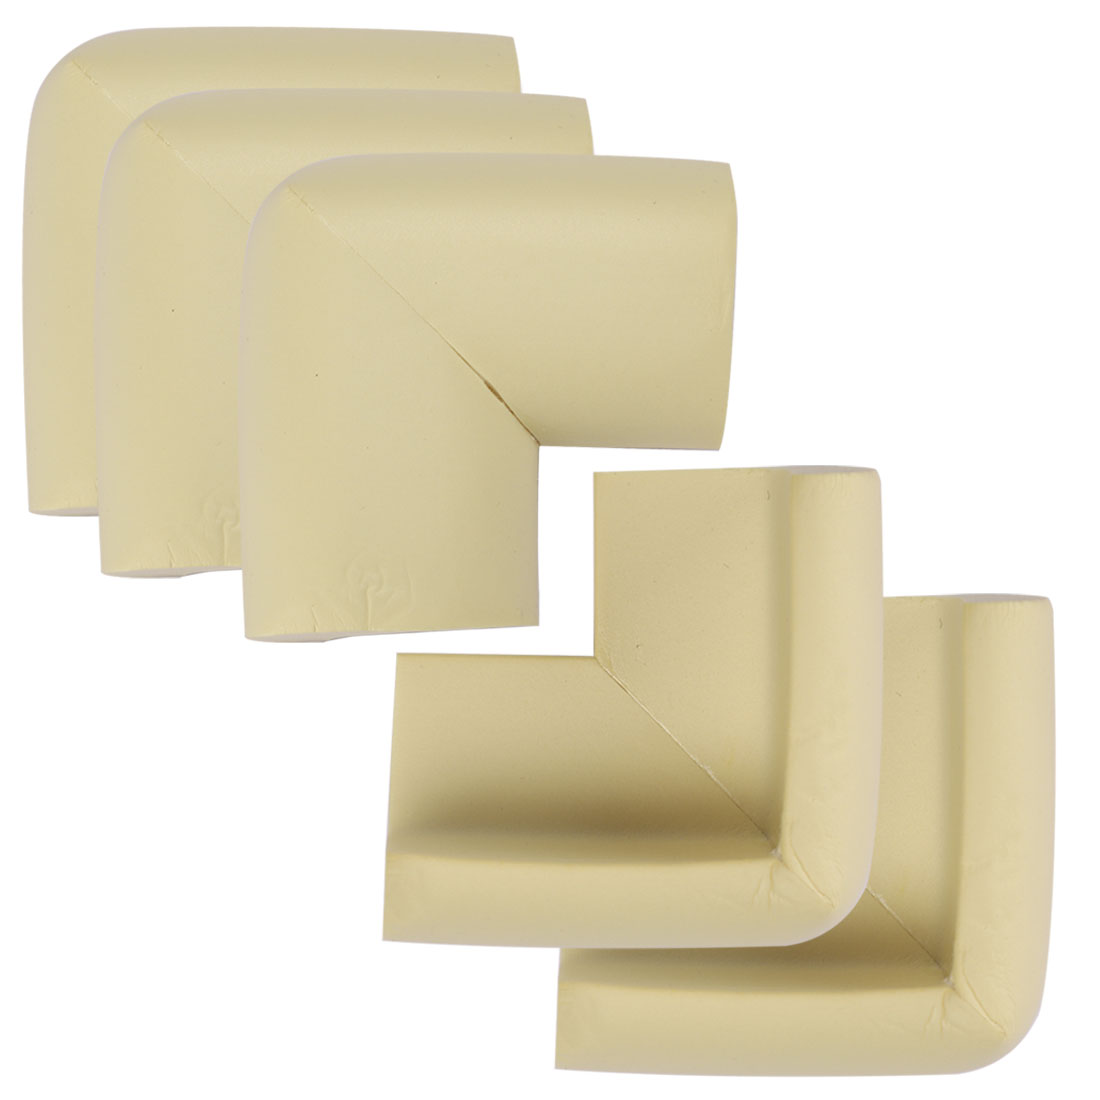 Desk Edge Foam Corner Cushion Guard Strip Soft Bumper Protector 5pcs Beiges